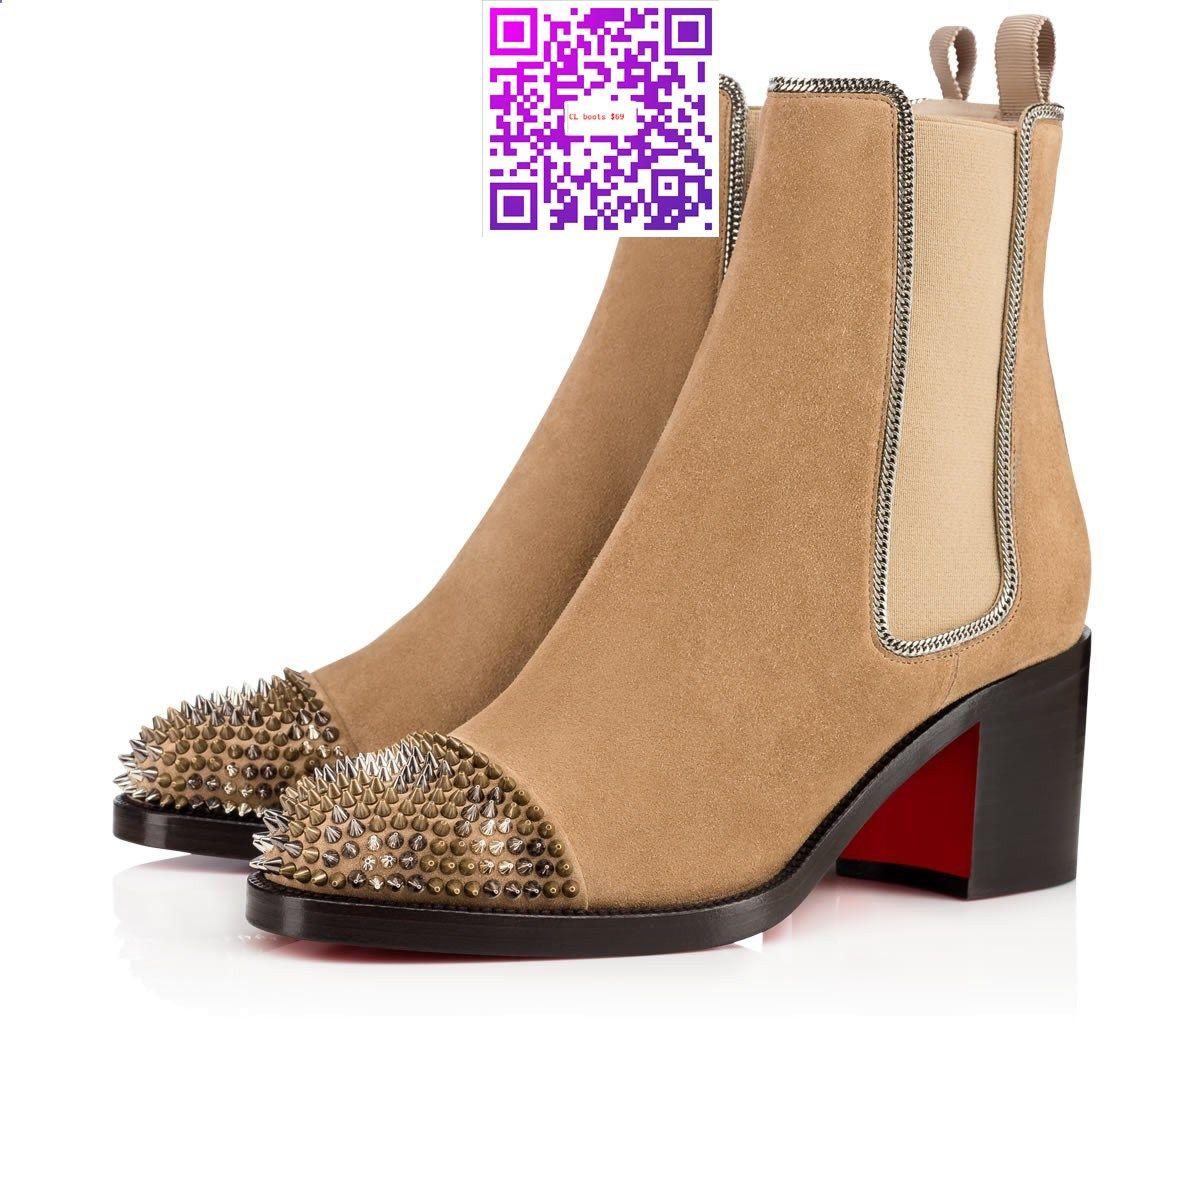 Shoes - Otaboo - Christian Louboutin